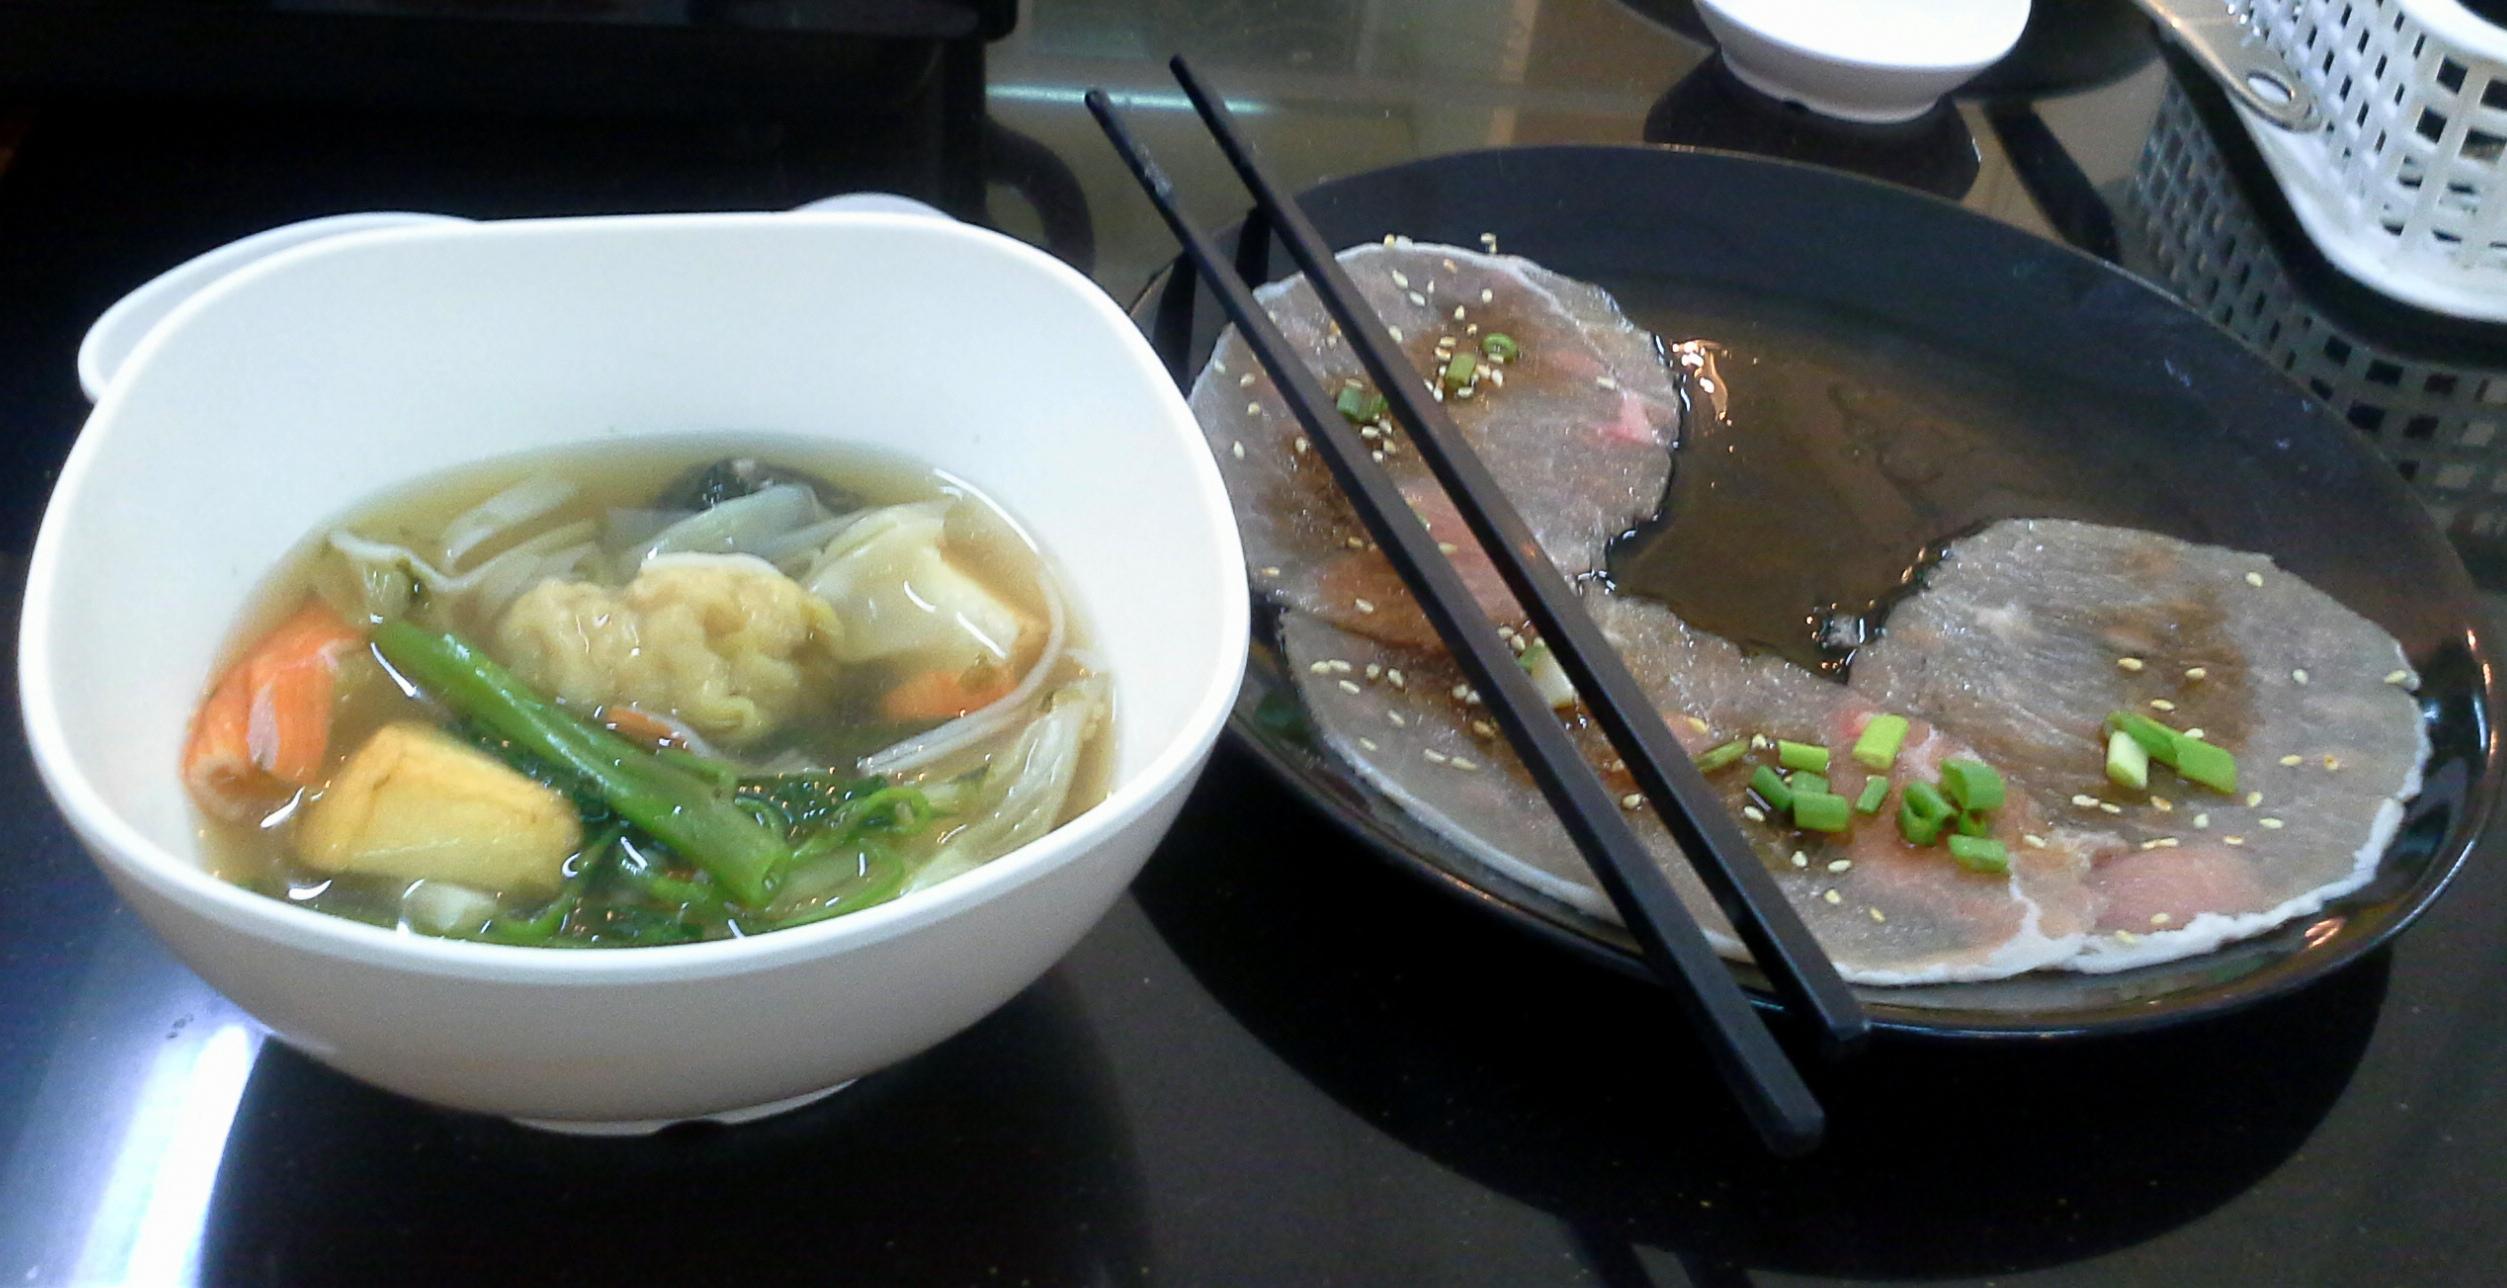 Just in time for Songkran dinner